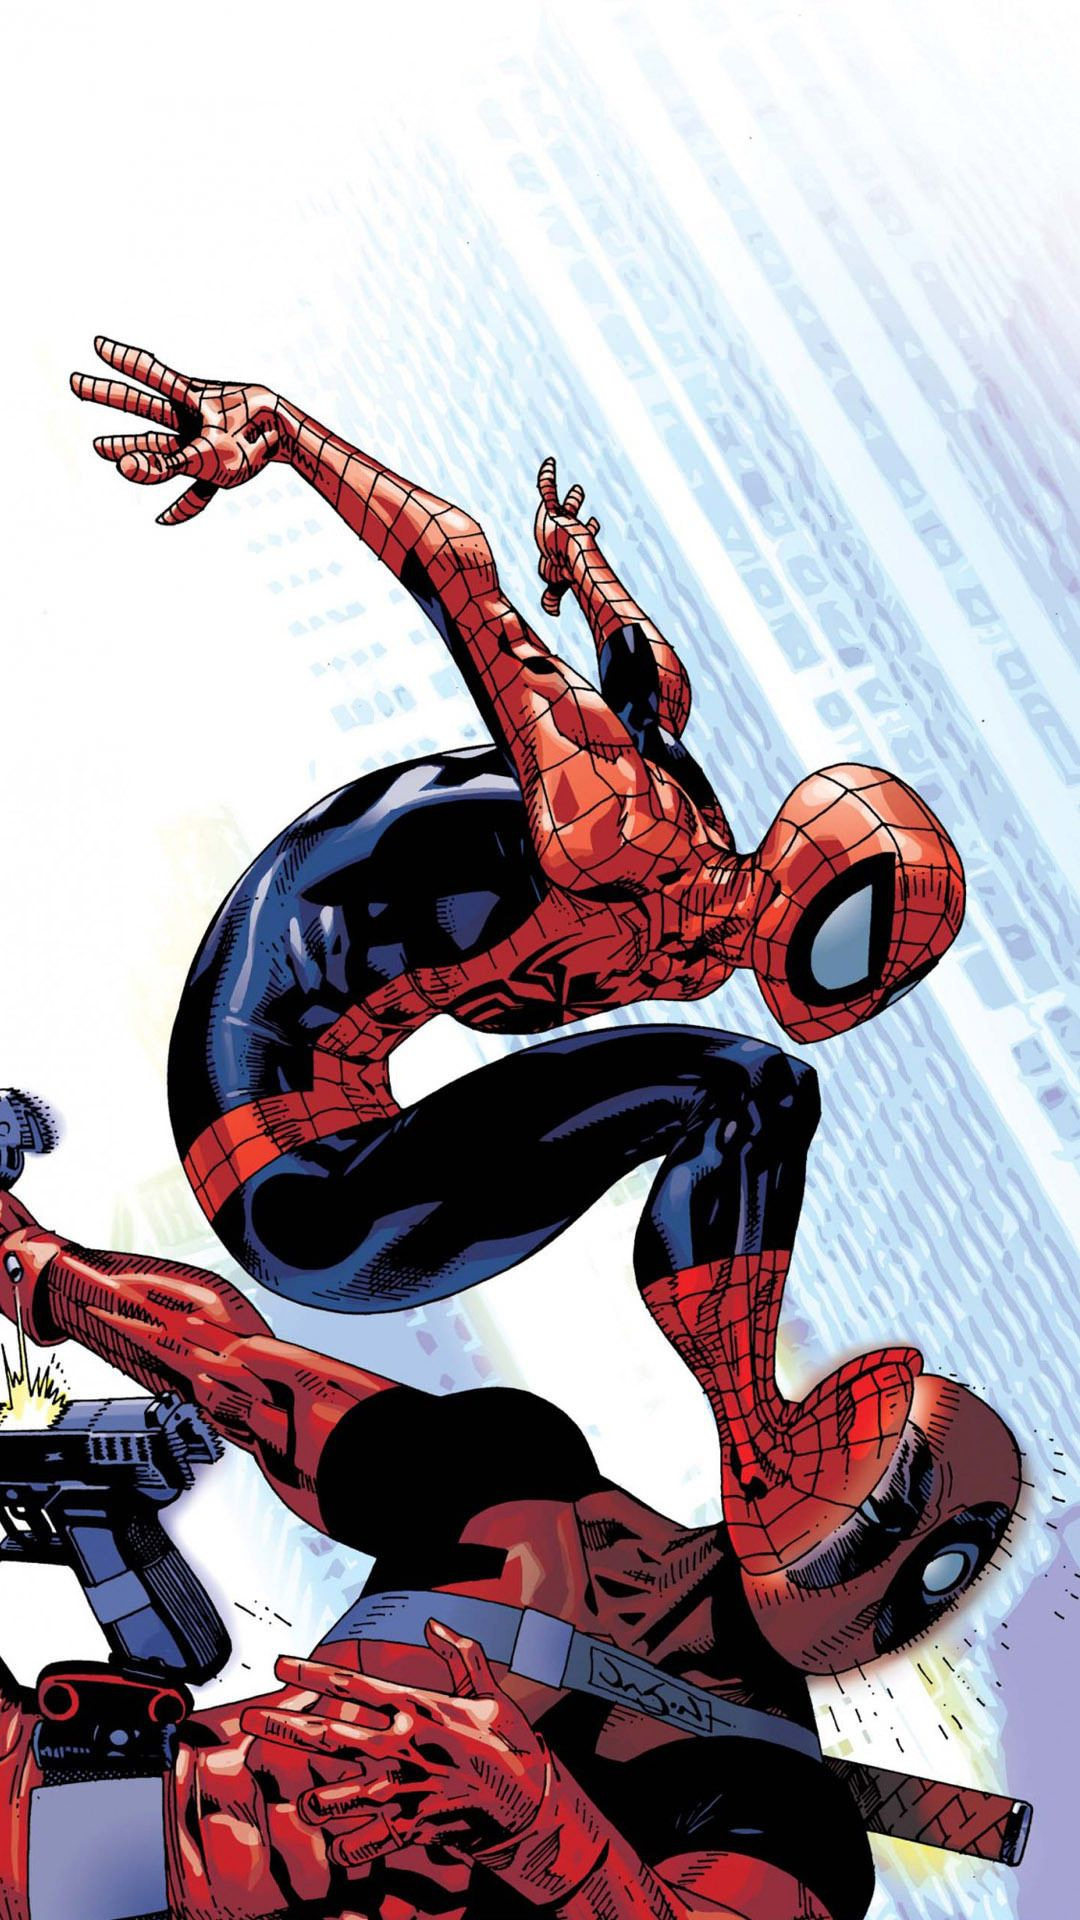 Spider Man Deadpool Cartoon Wallpapers Top Free Spider Man